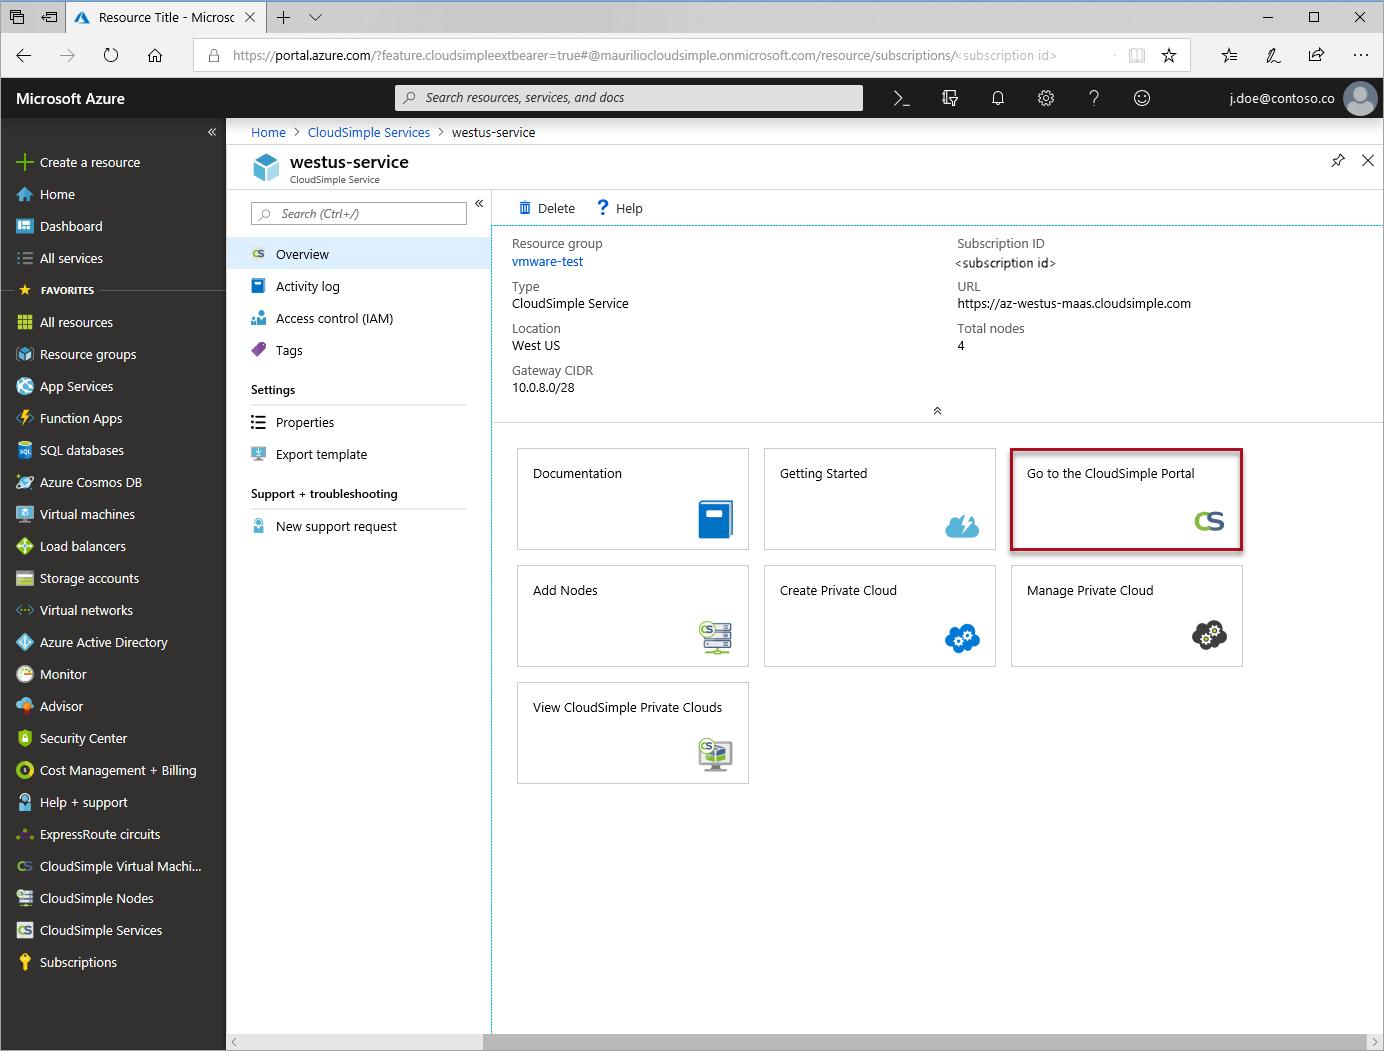 Quickstart - Create a VMware VM on Private Cloud | Microsoft